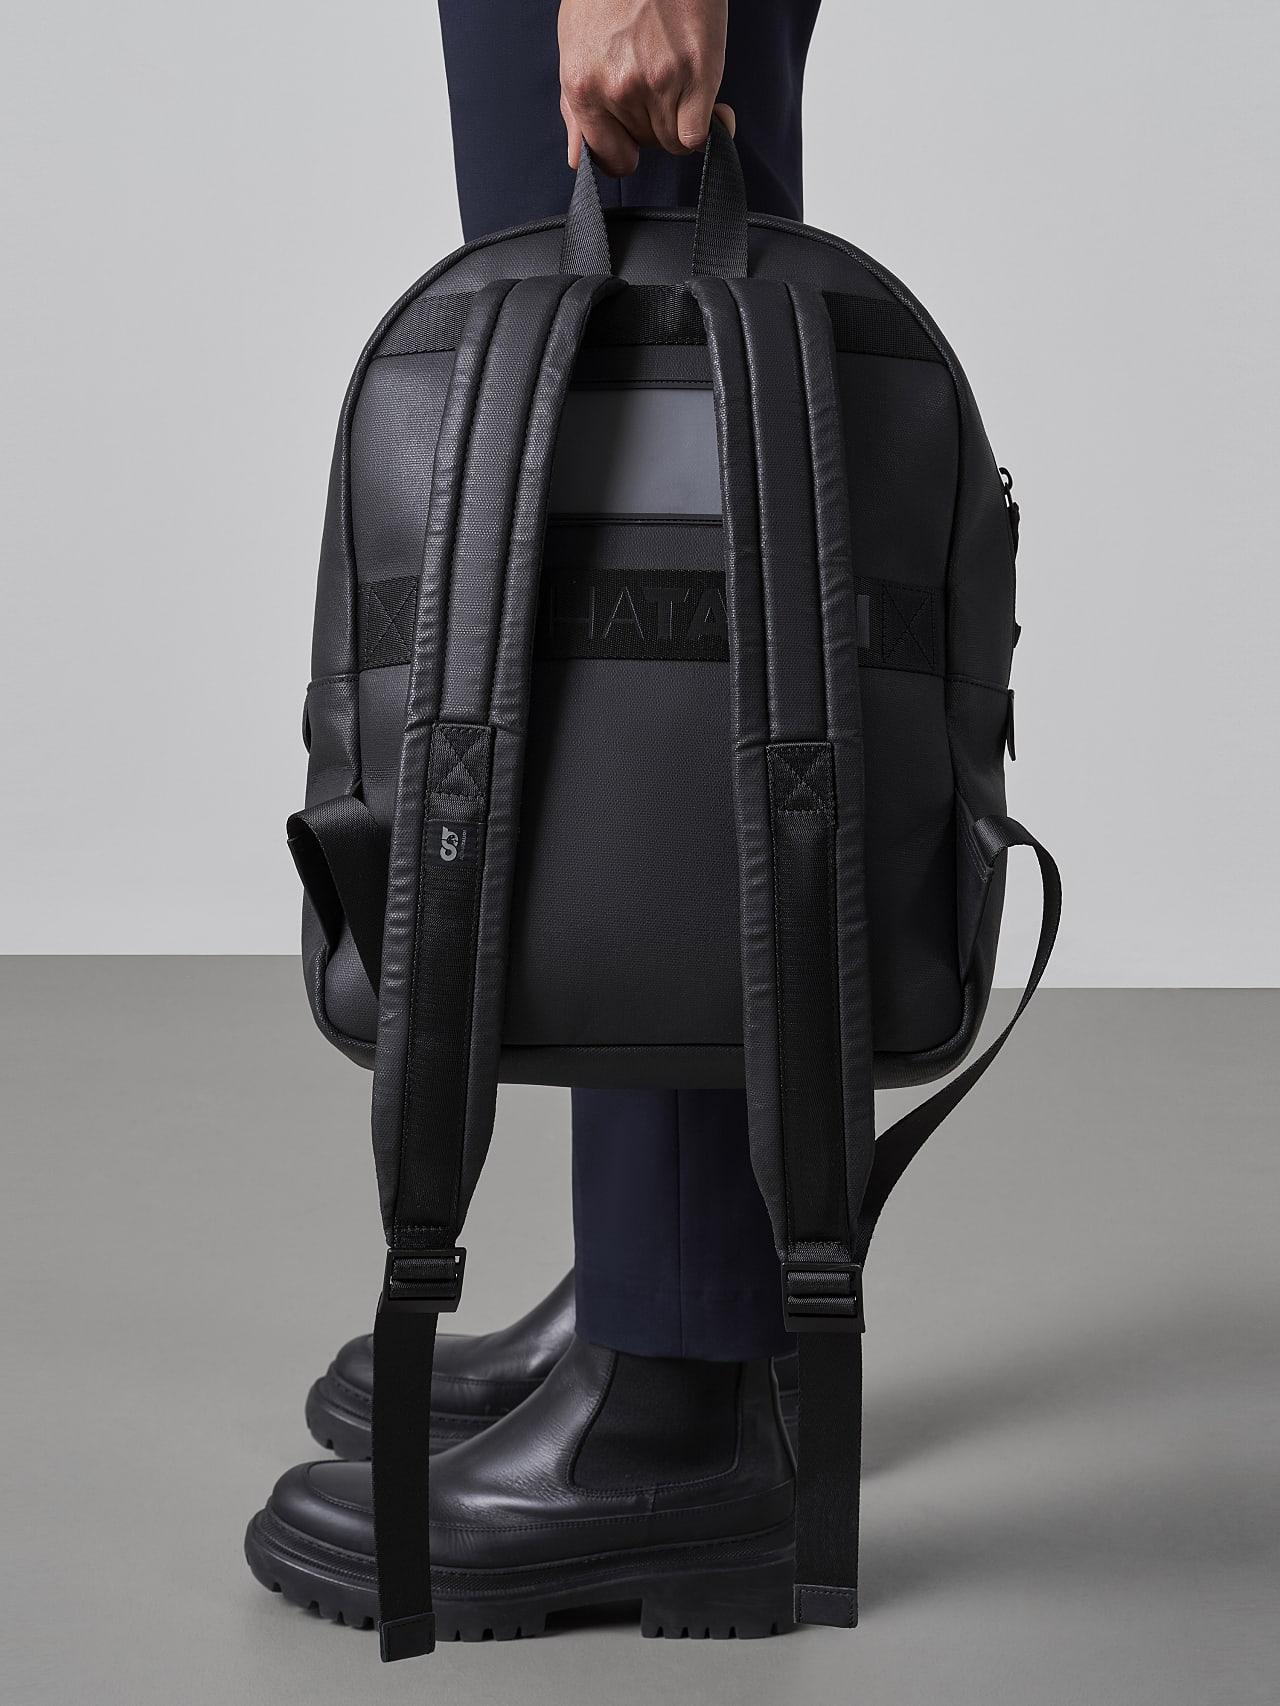 AREKK V2.Y5.02 Water-Repellent Backpack dark grey / anthracite Model shot Alpha Tauri